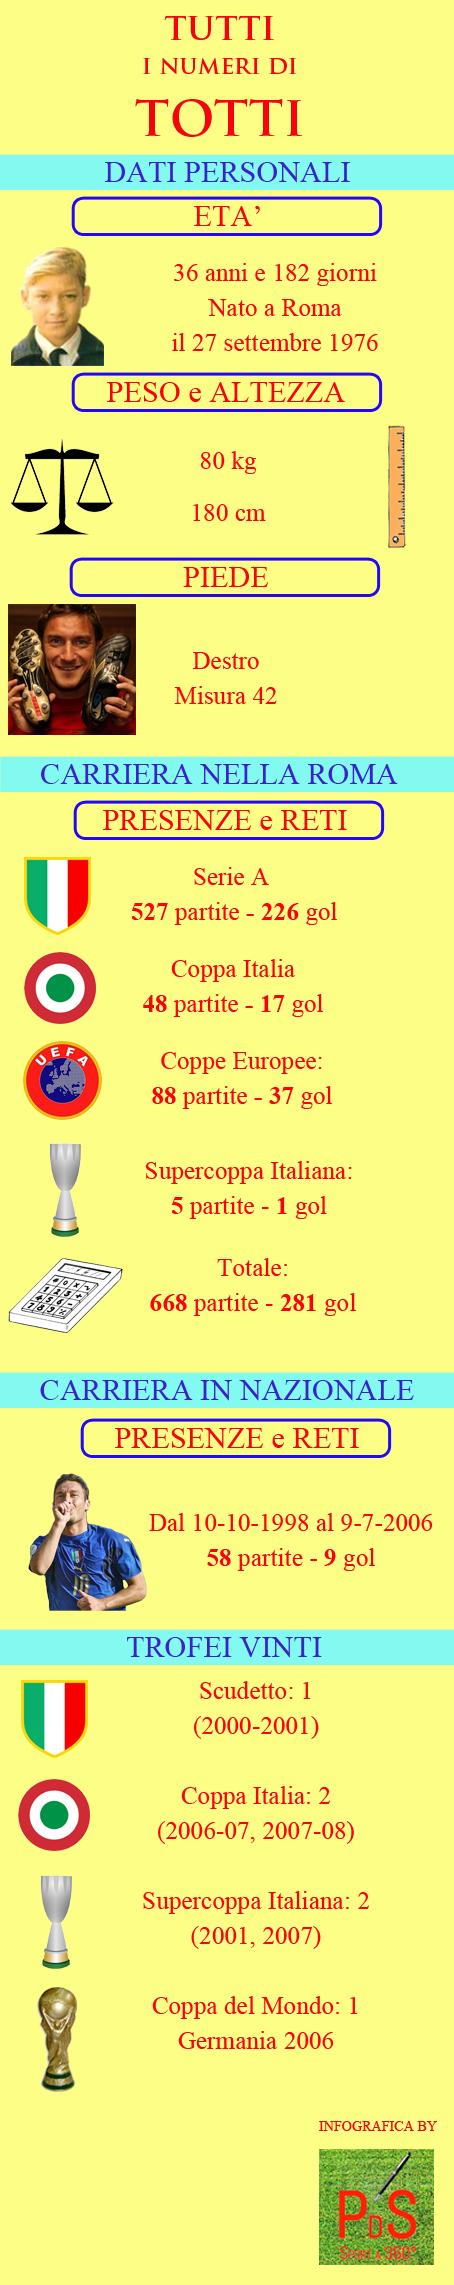 Infografica Totti